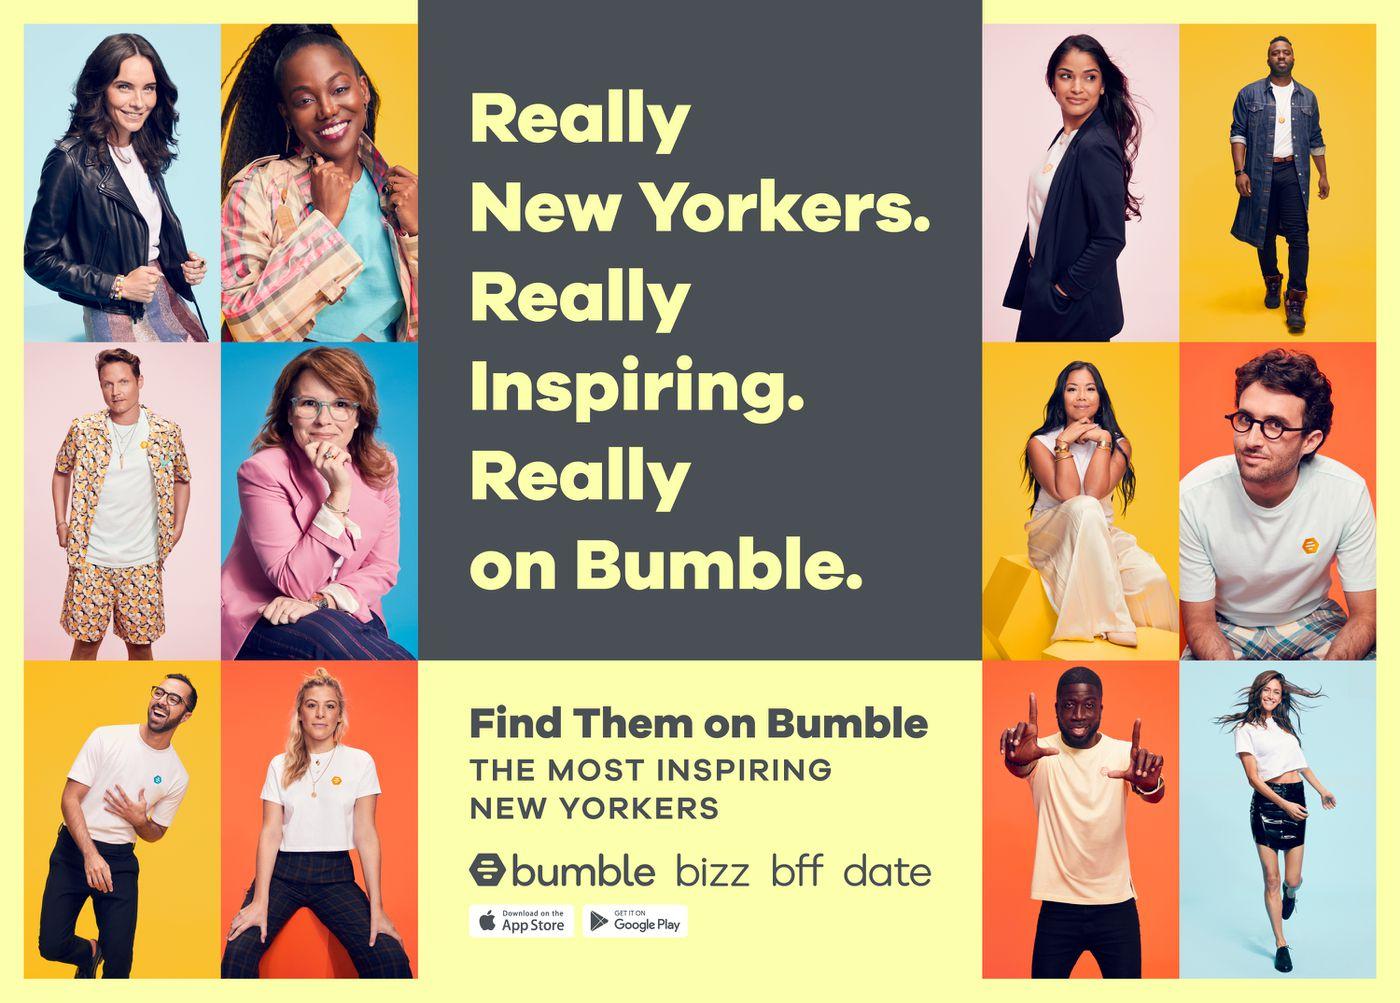 Model better ad than tinder Tinder's Business